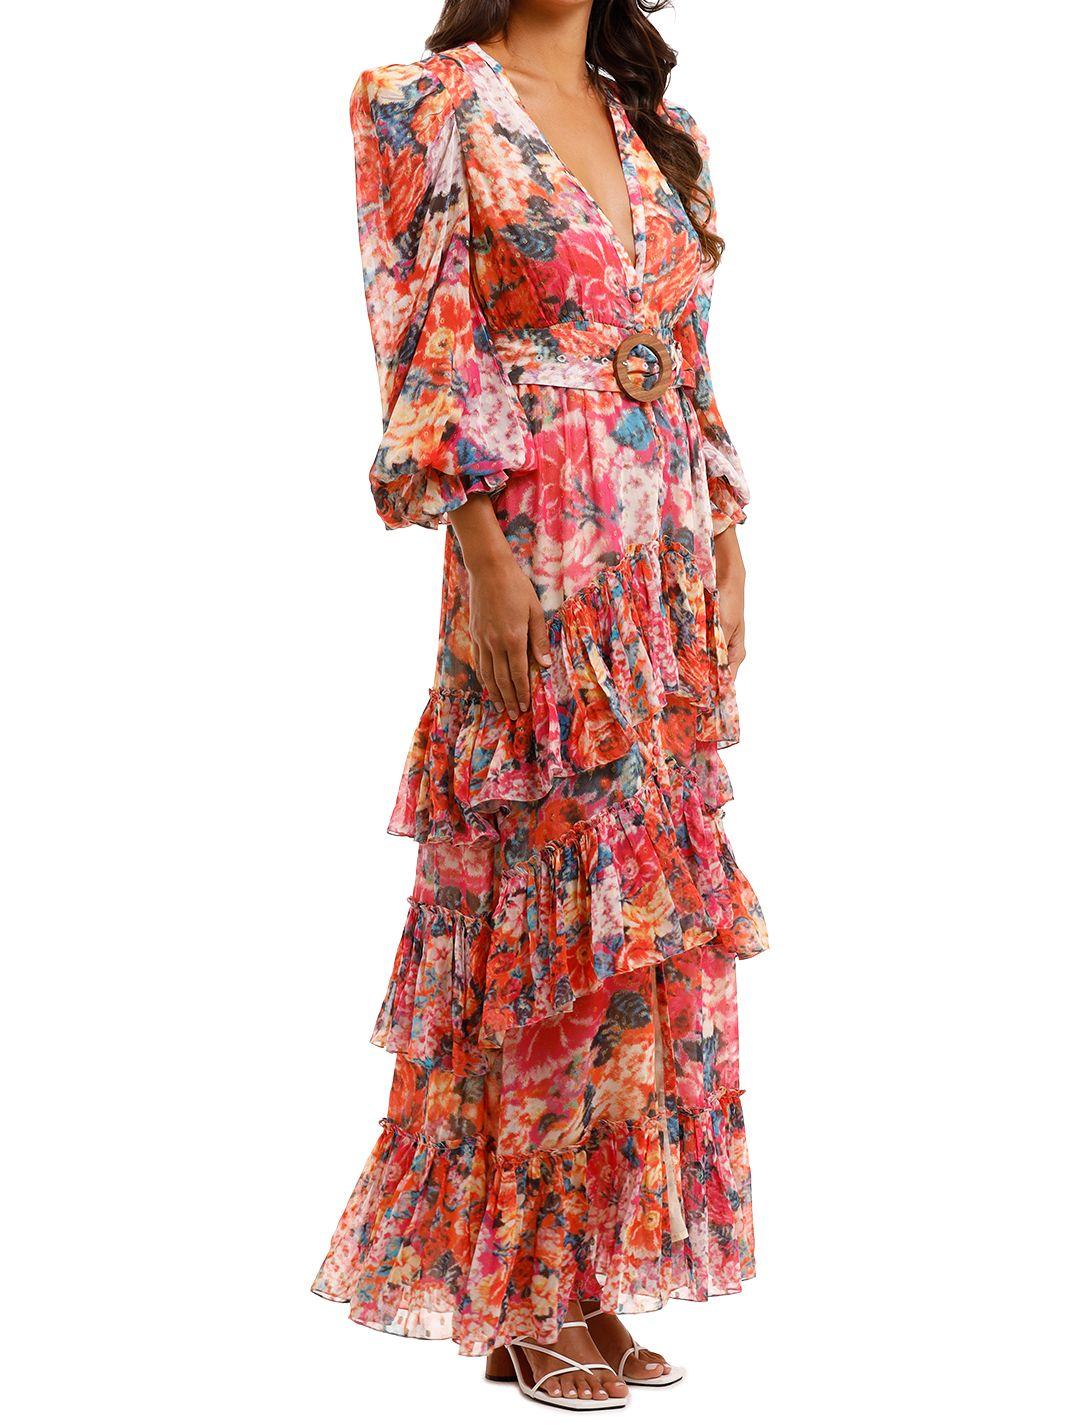 Rococo Sand Peony Maxi Dress Ruffle tiered skirt